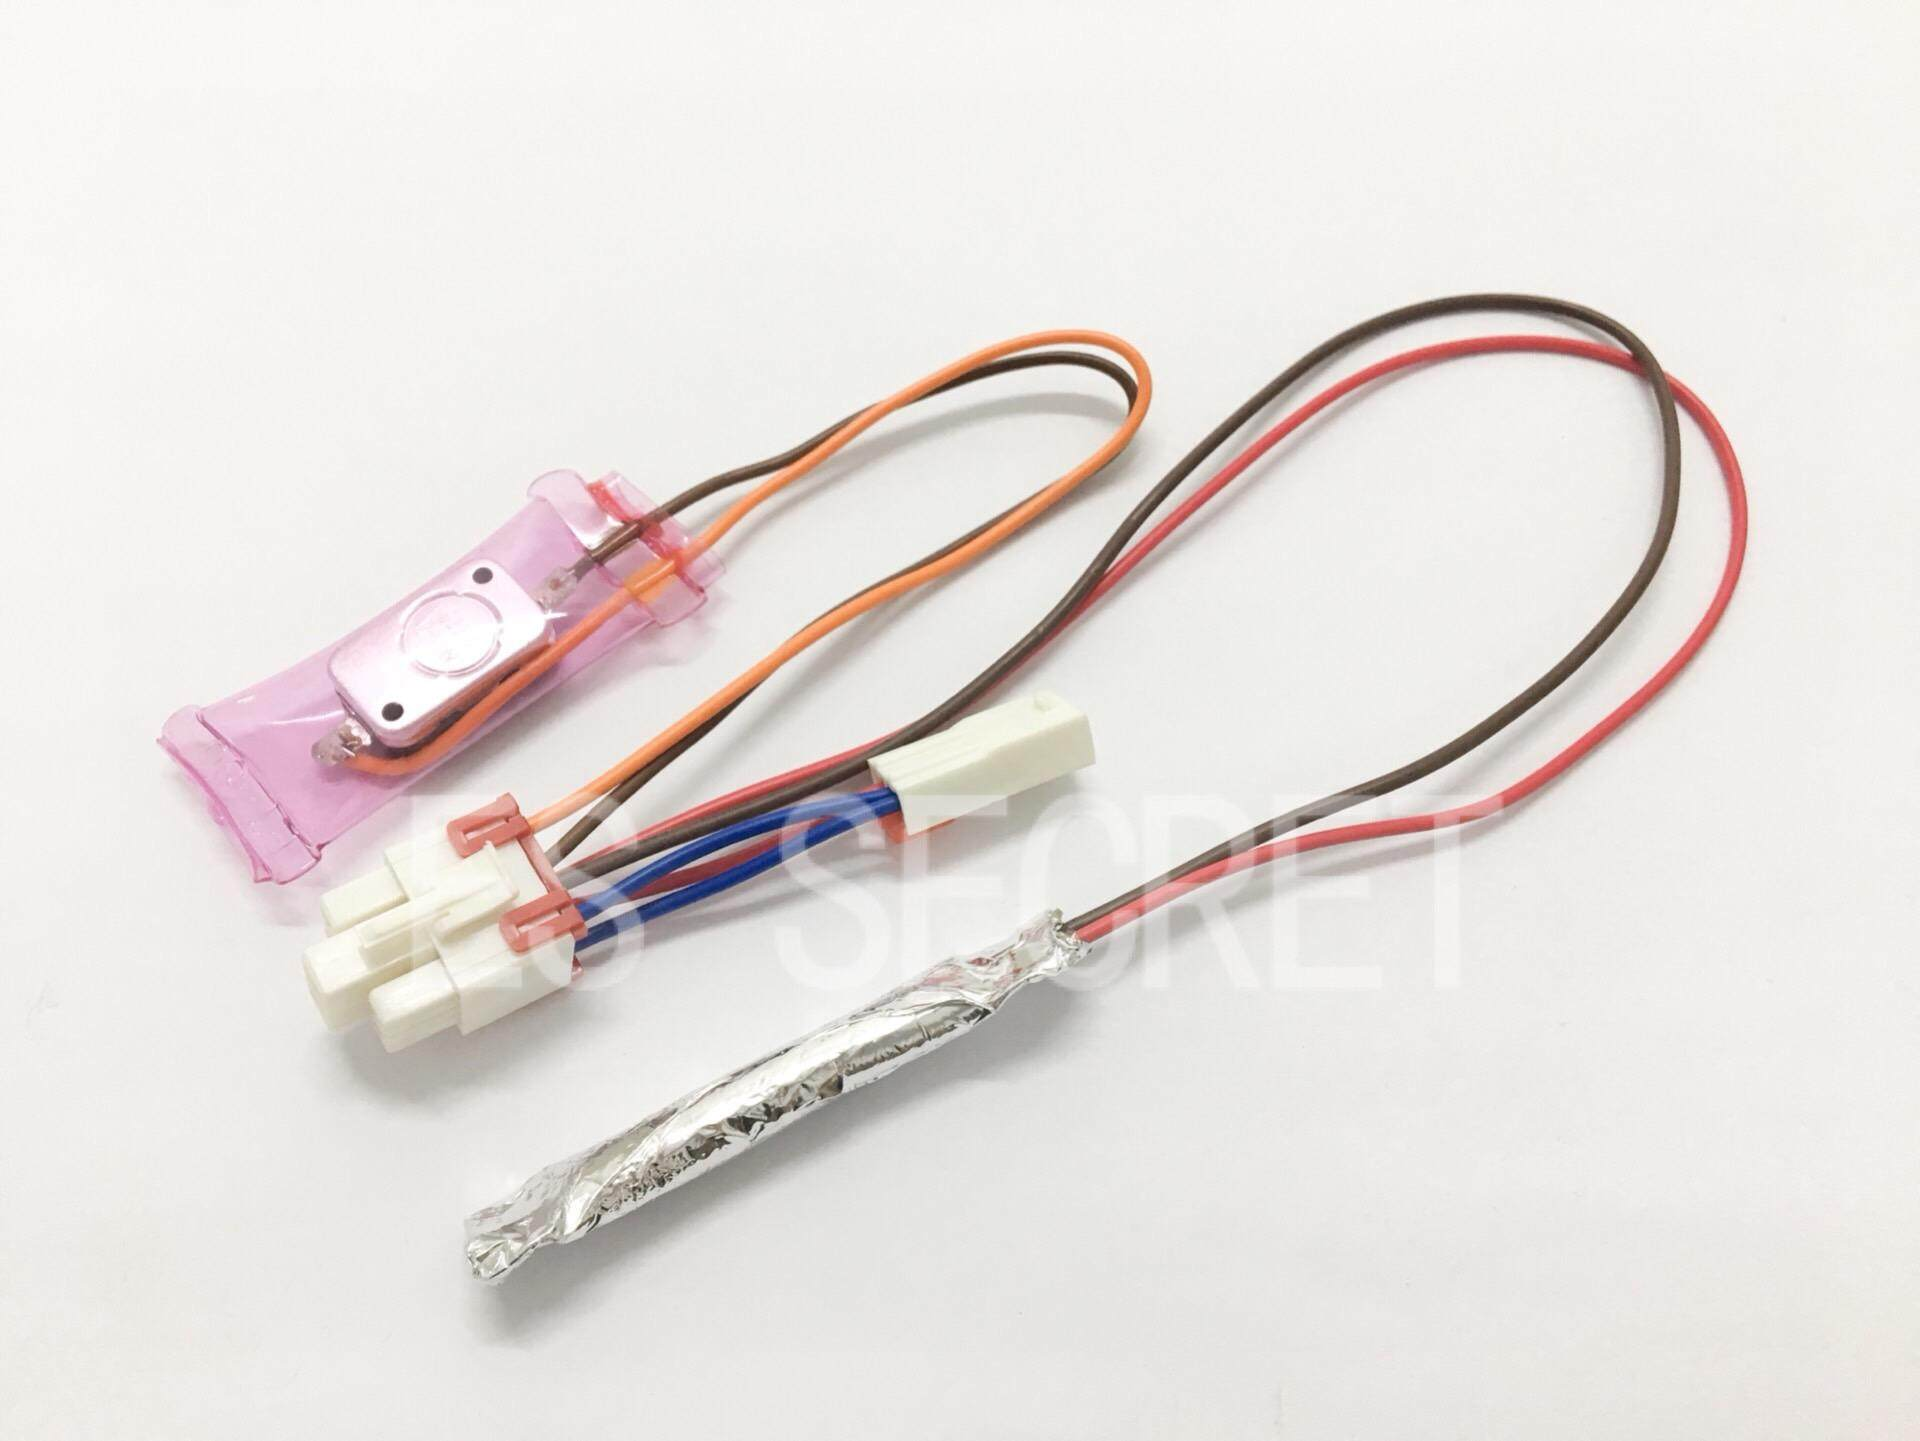 LG/Elba Defrost Thermostat